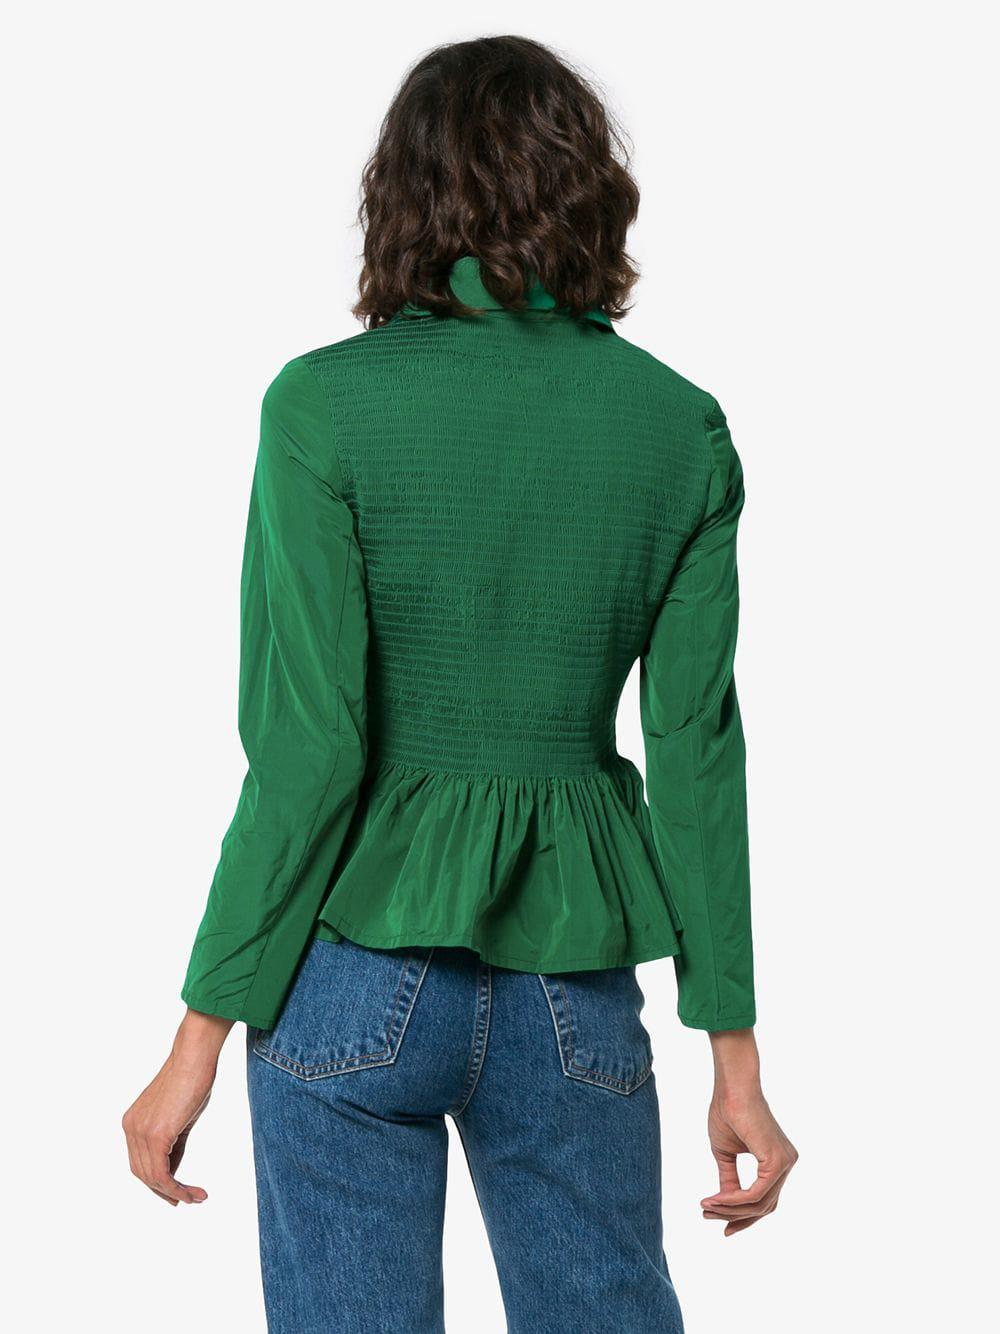 Molly Hem Goddard Zip Lyst Peplum Green Fullscreen View Jacket Lillian IwIdFqrcg